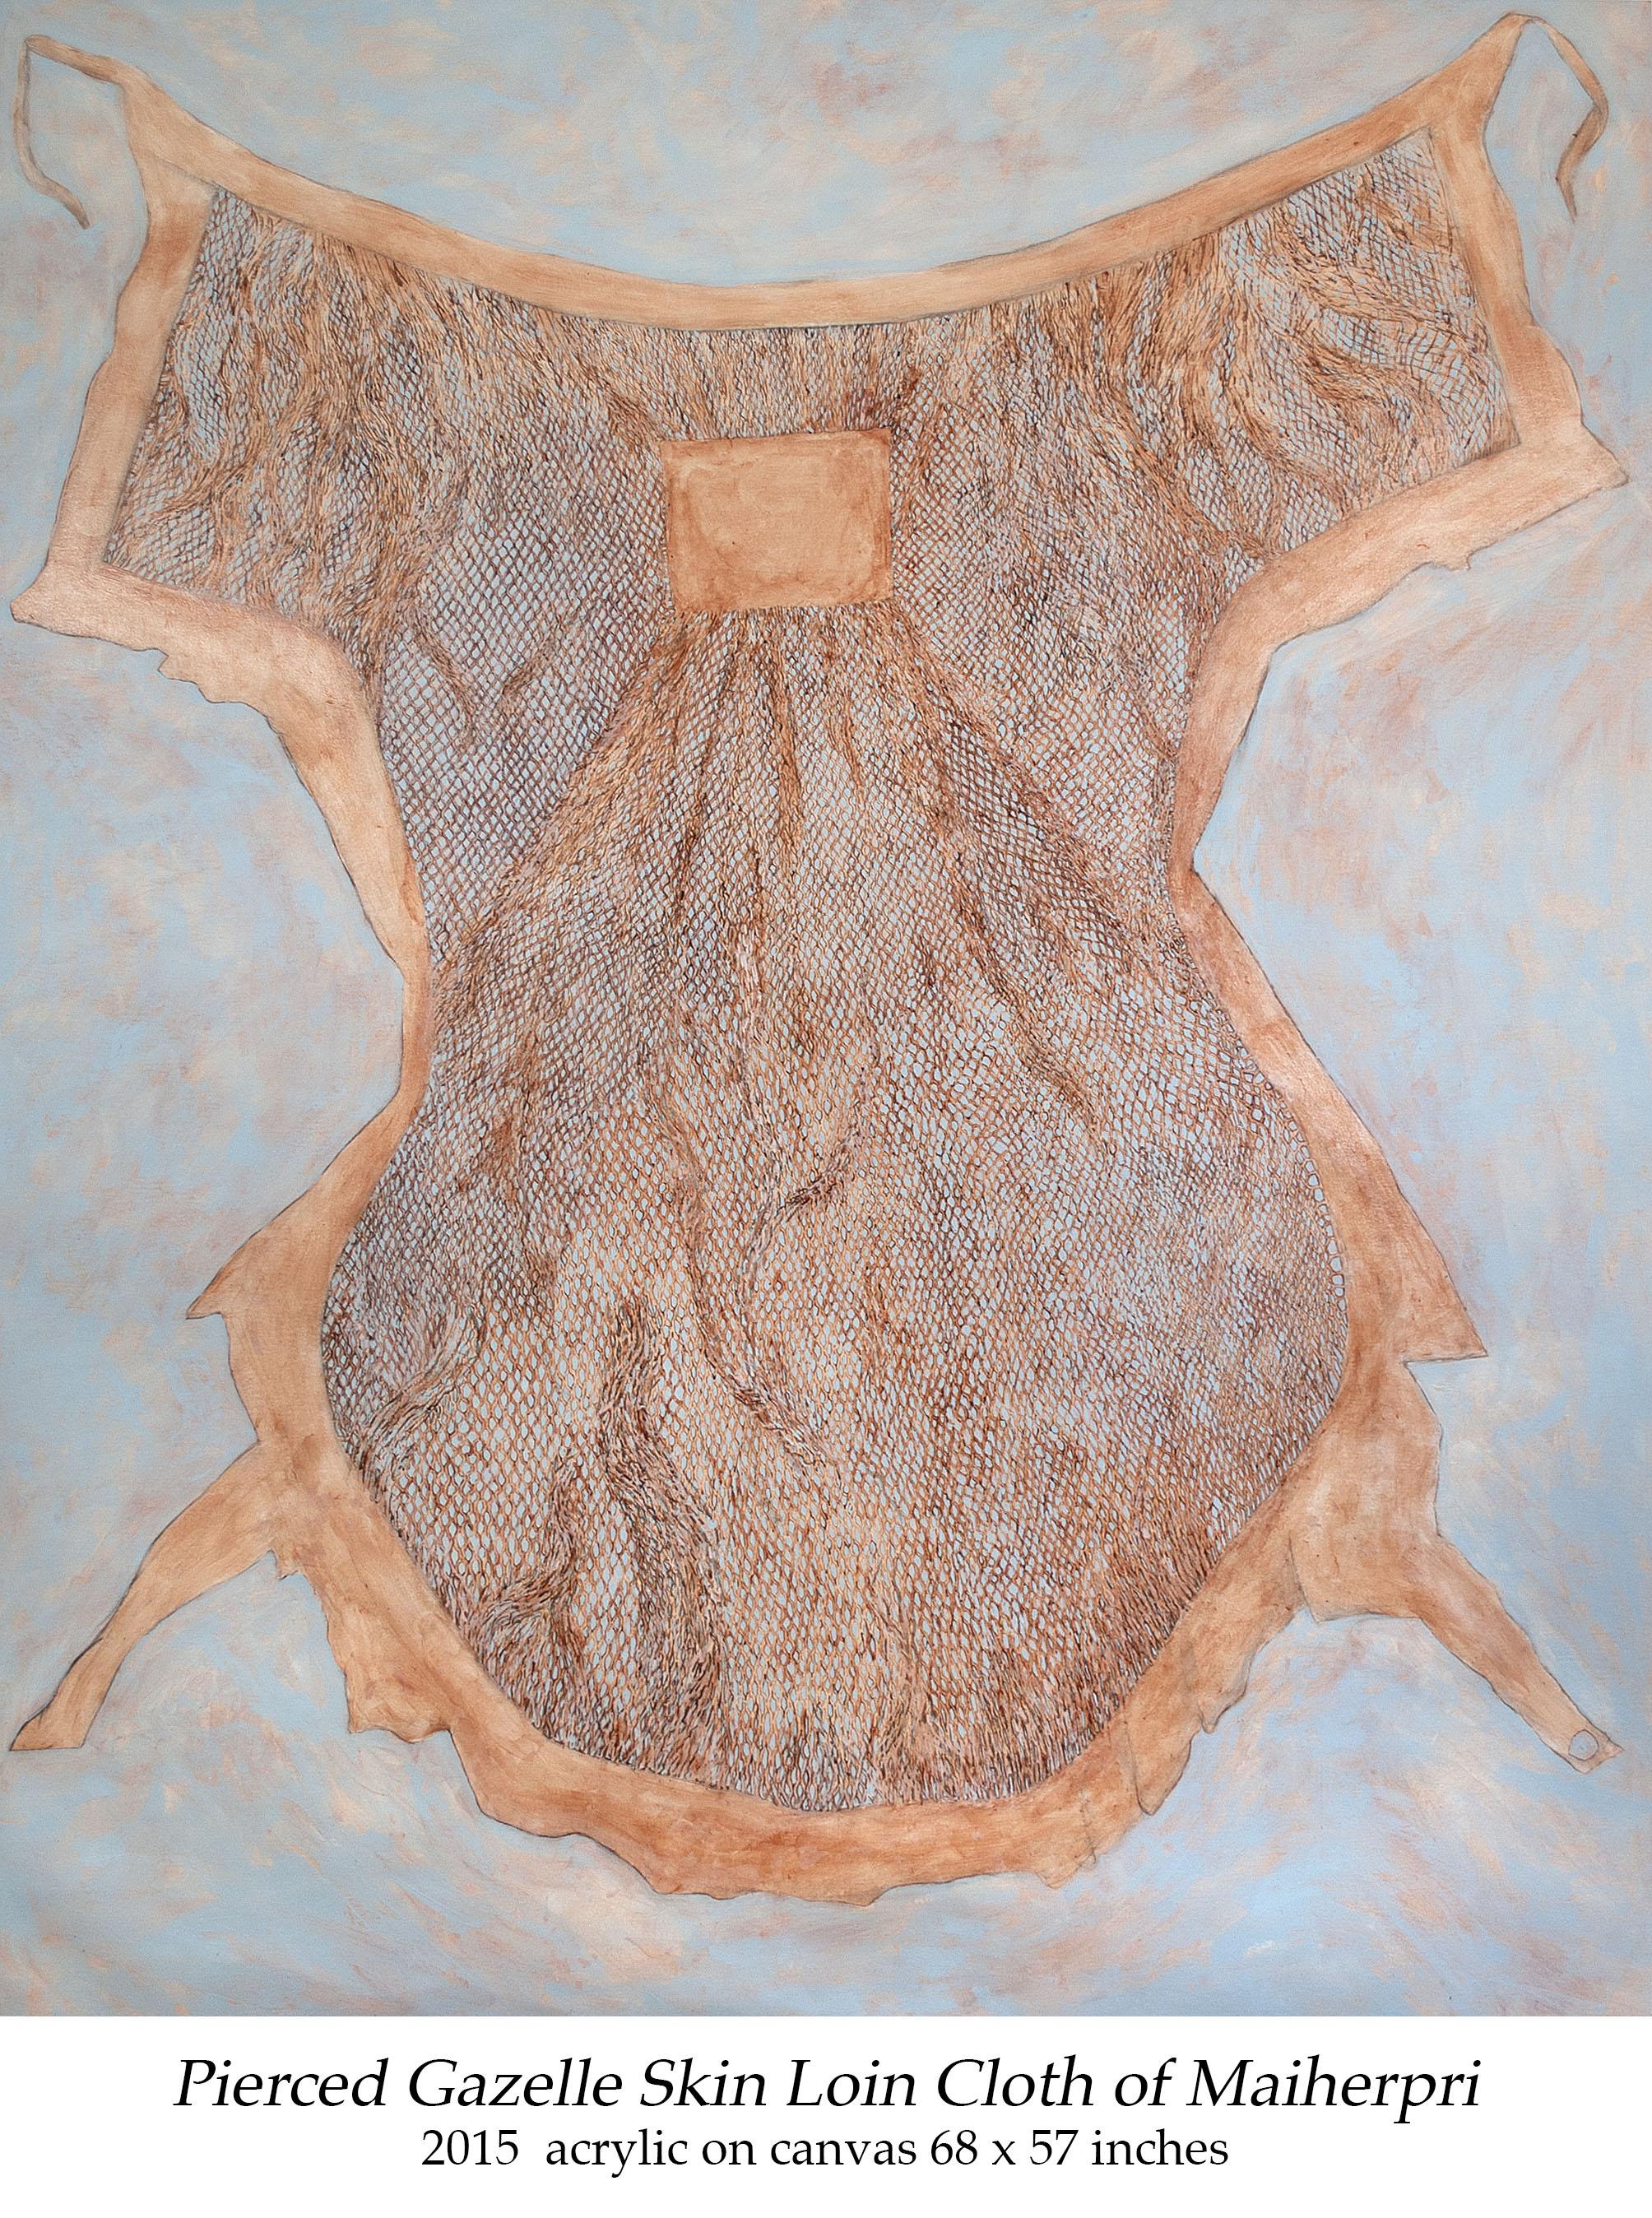 Pierced Gazelle Skin Loin Cloth of Maiherpri 2015 acrylic on canvas 68 x 57 inches.jpg